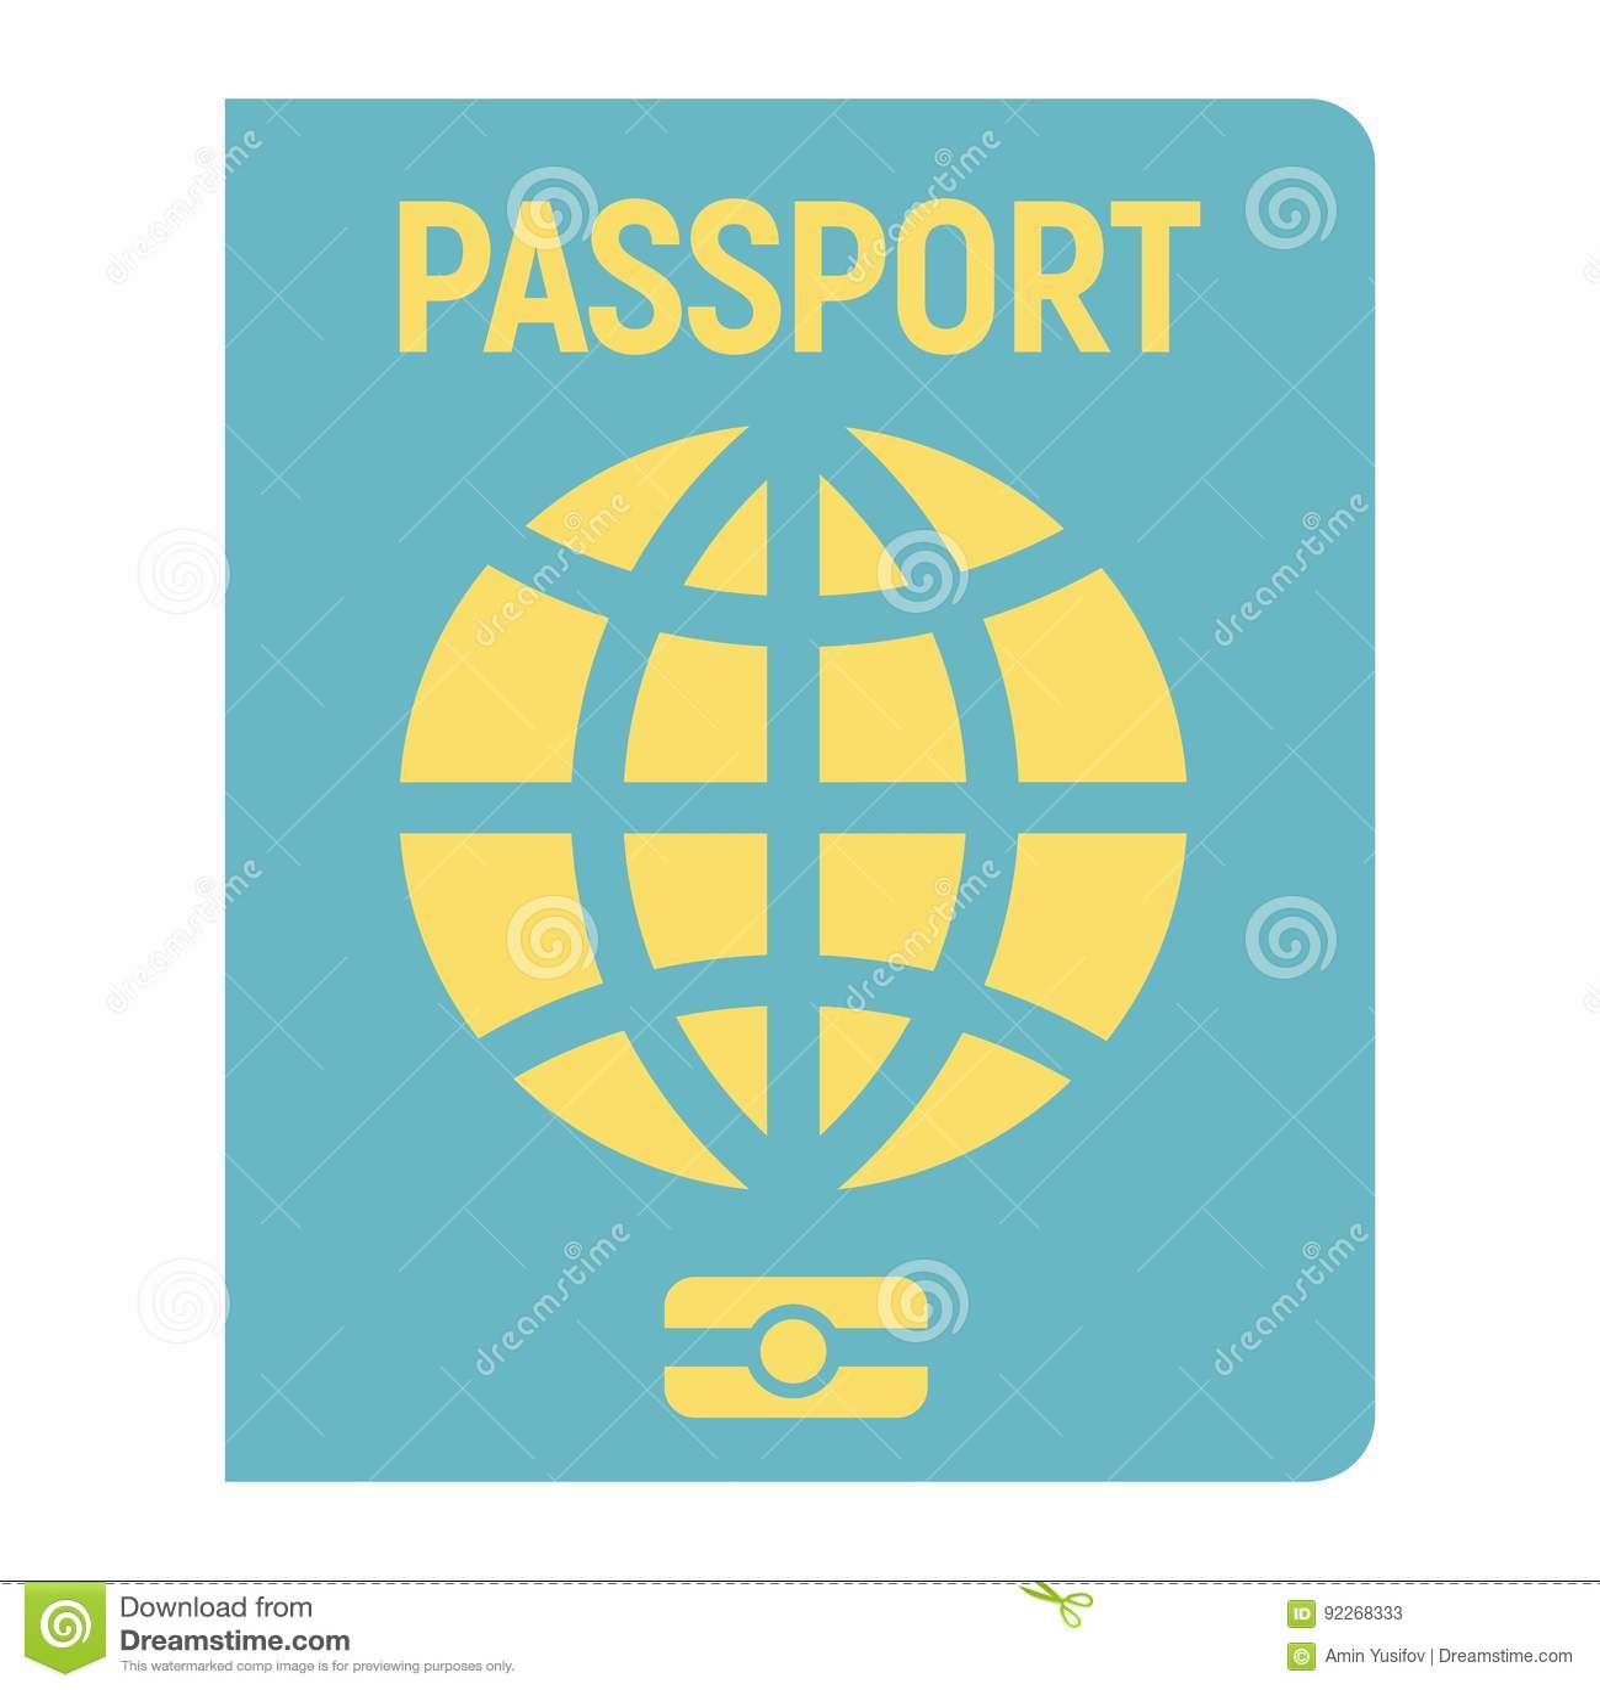 Passport flat icon, travel and citizenship